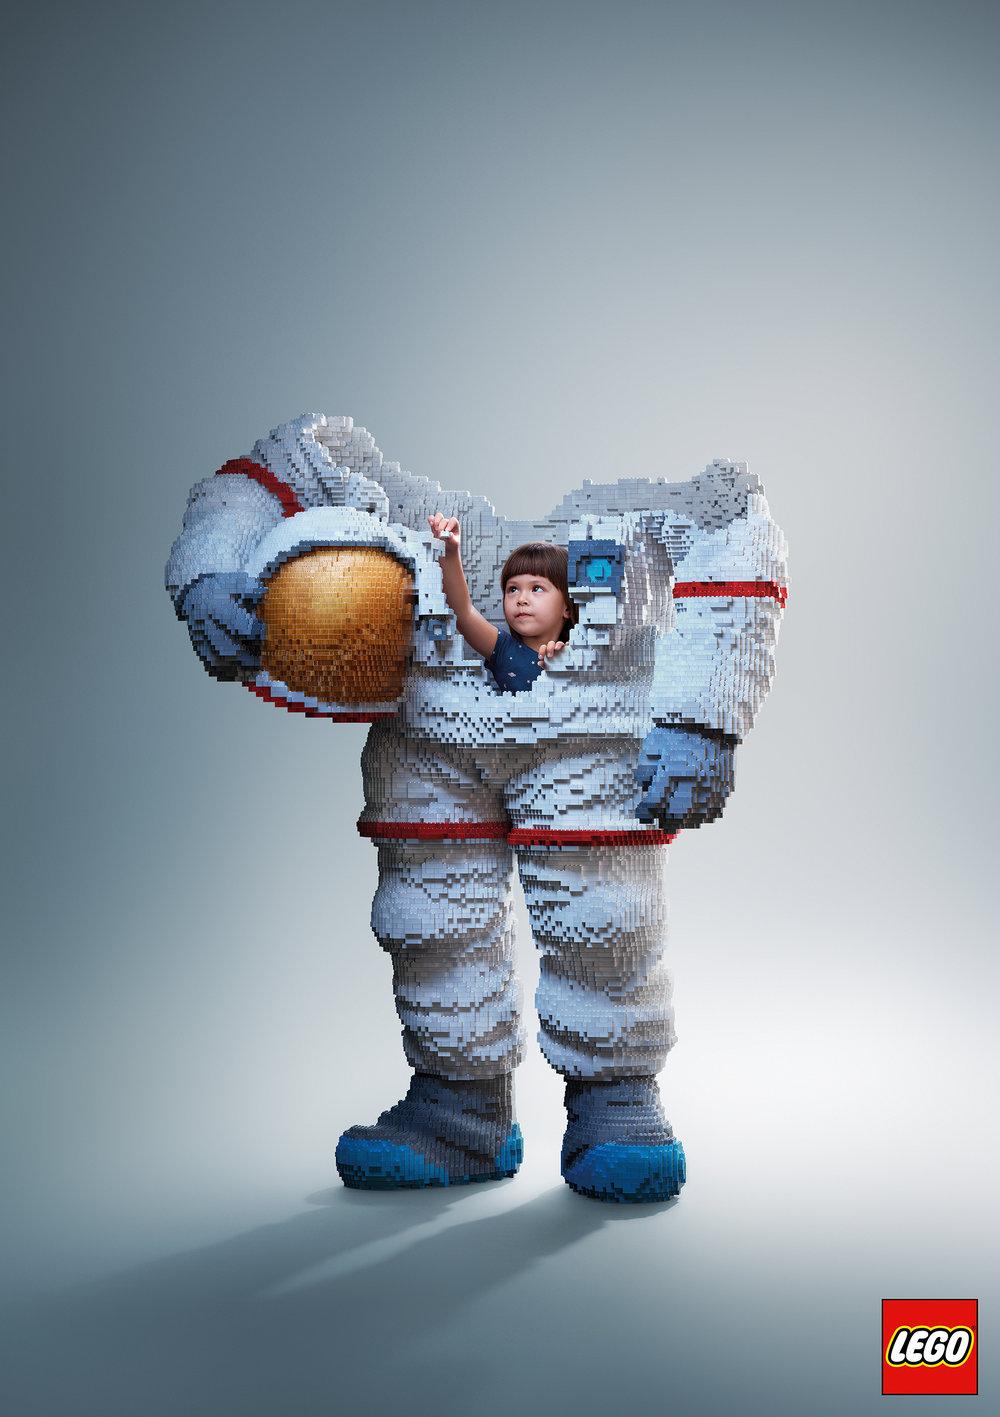 A_Astronaut_Srgb Hires.jpg